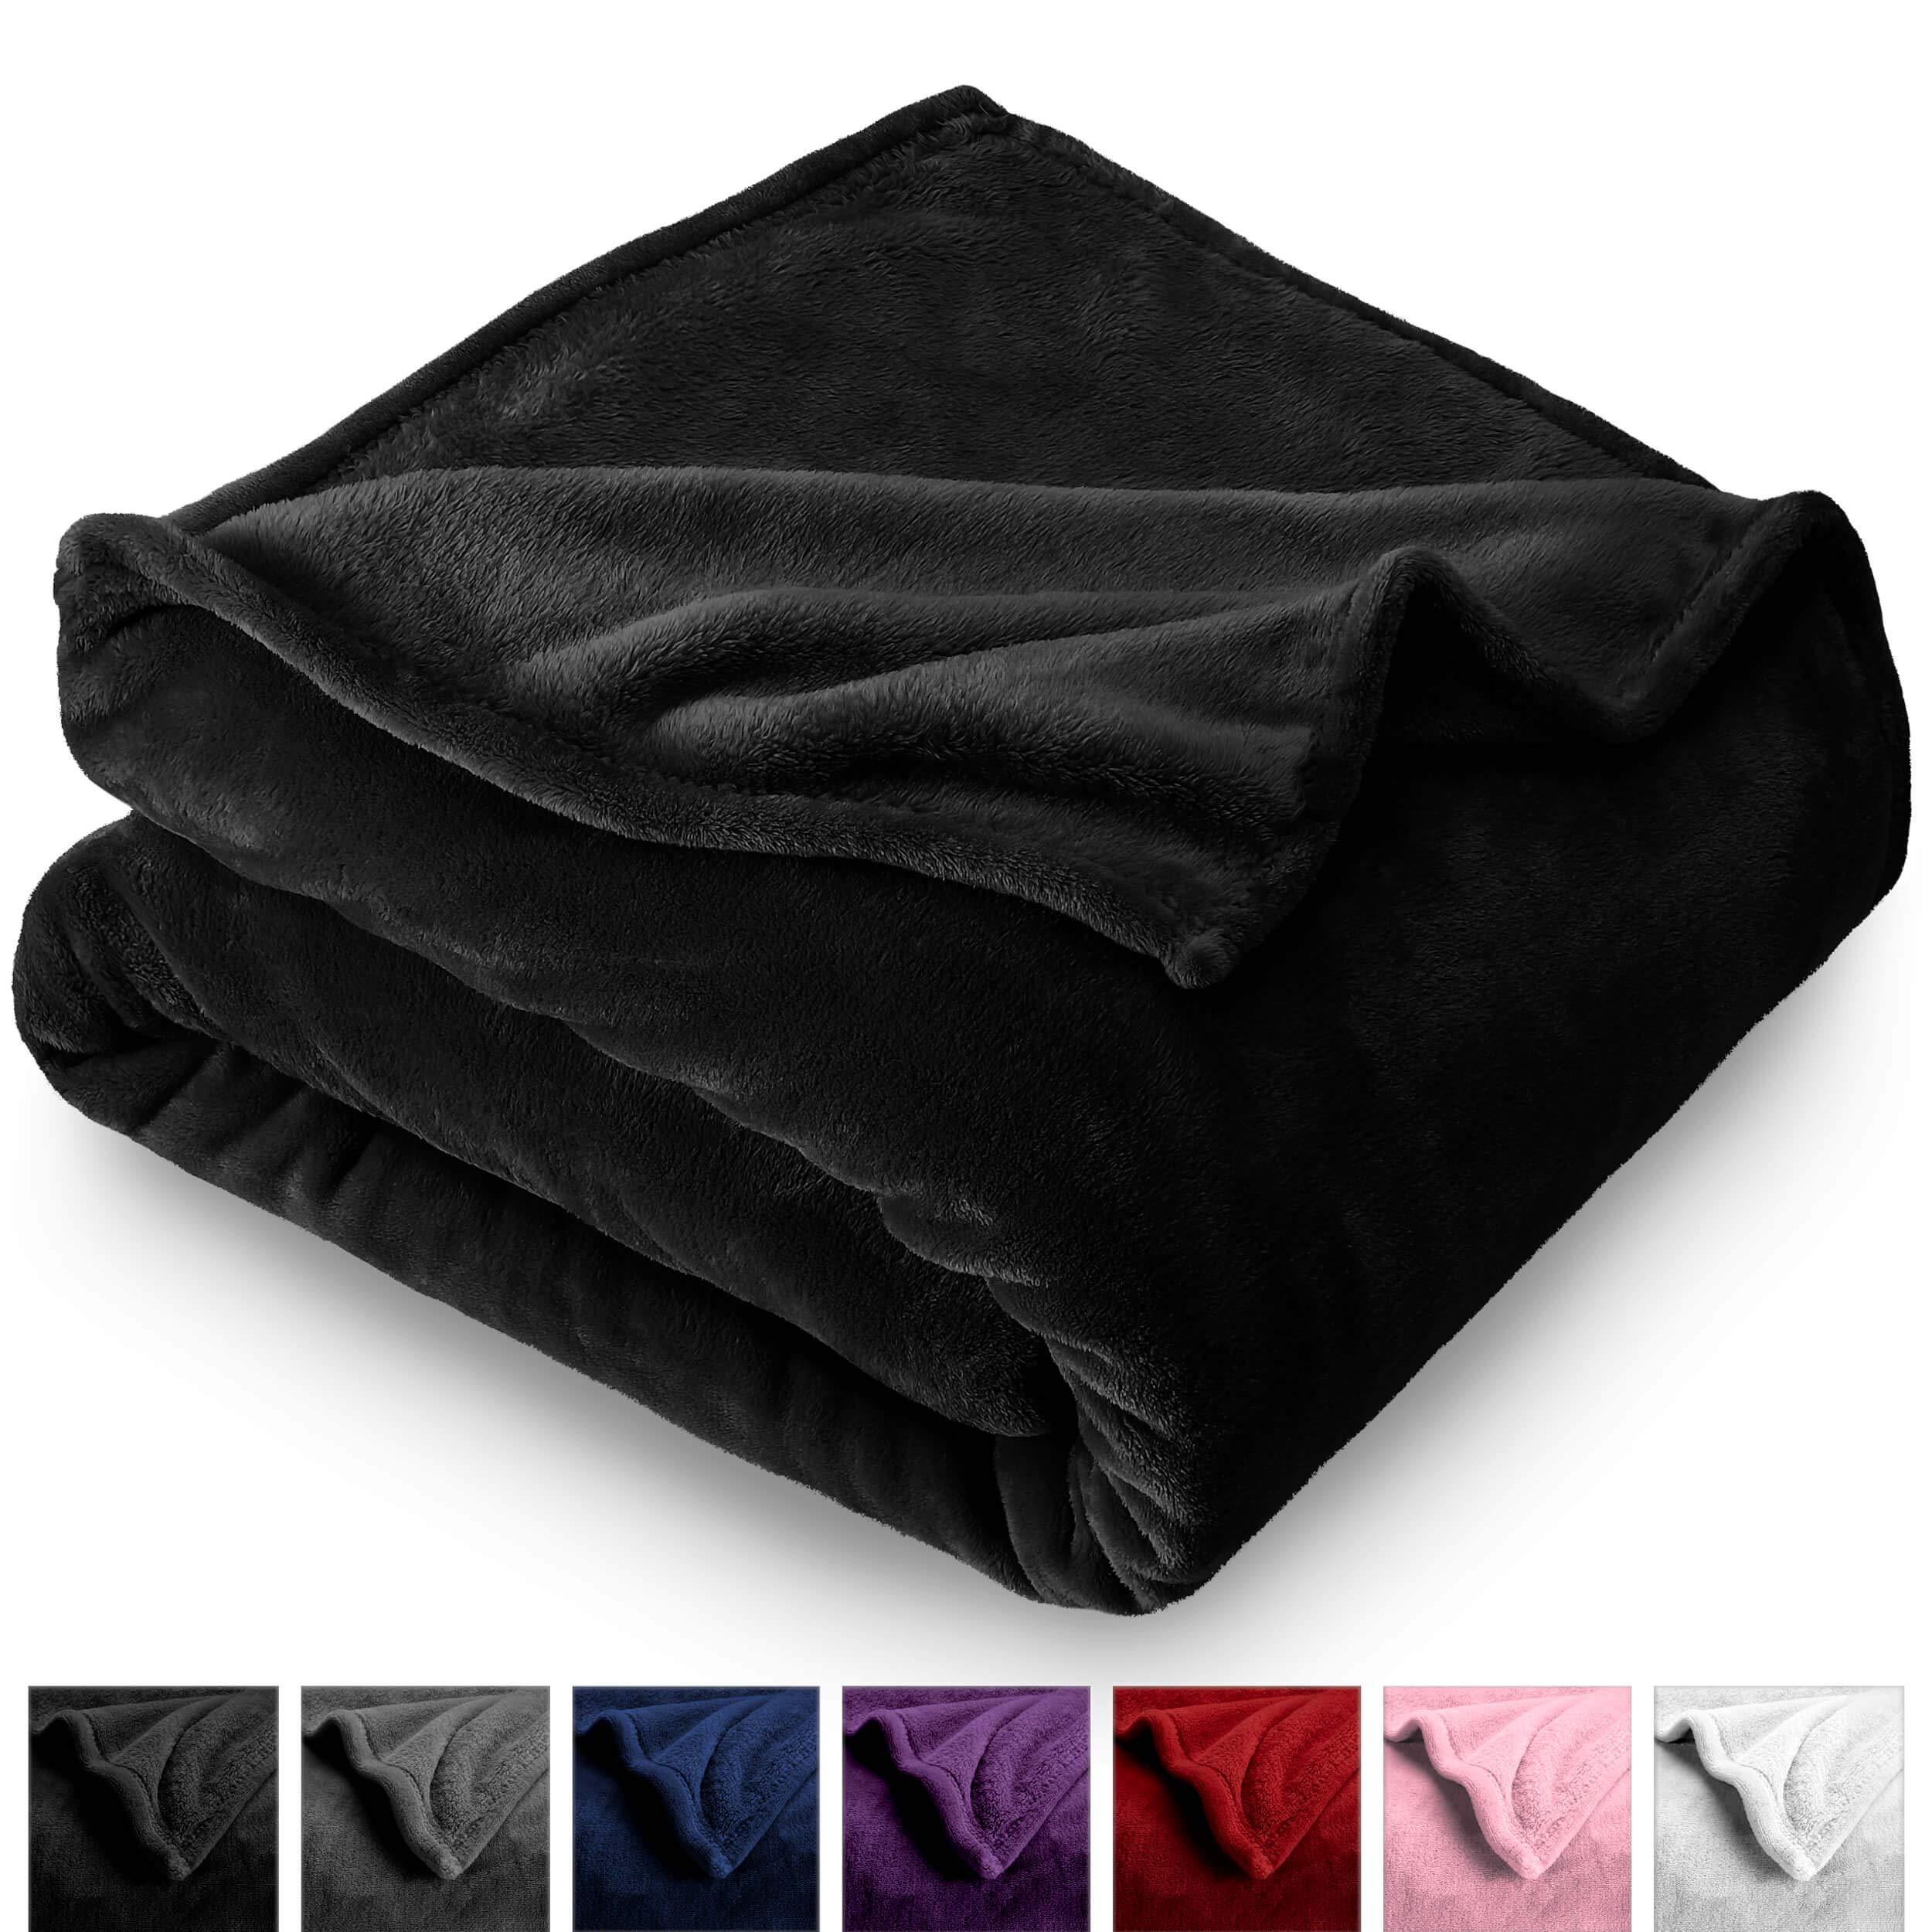 Bare Home Microplush Velvet Fleece Blanket - Full/Queen - Ultra-Soft - Luxurious Fuzzy Fleece Fur - Cozy Lightweight - Easy Care - All Season Premium Bed Blanket (Full/Queen, Black) by Bare Home